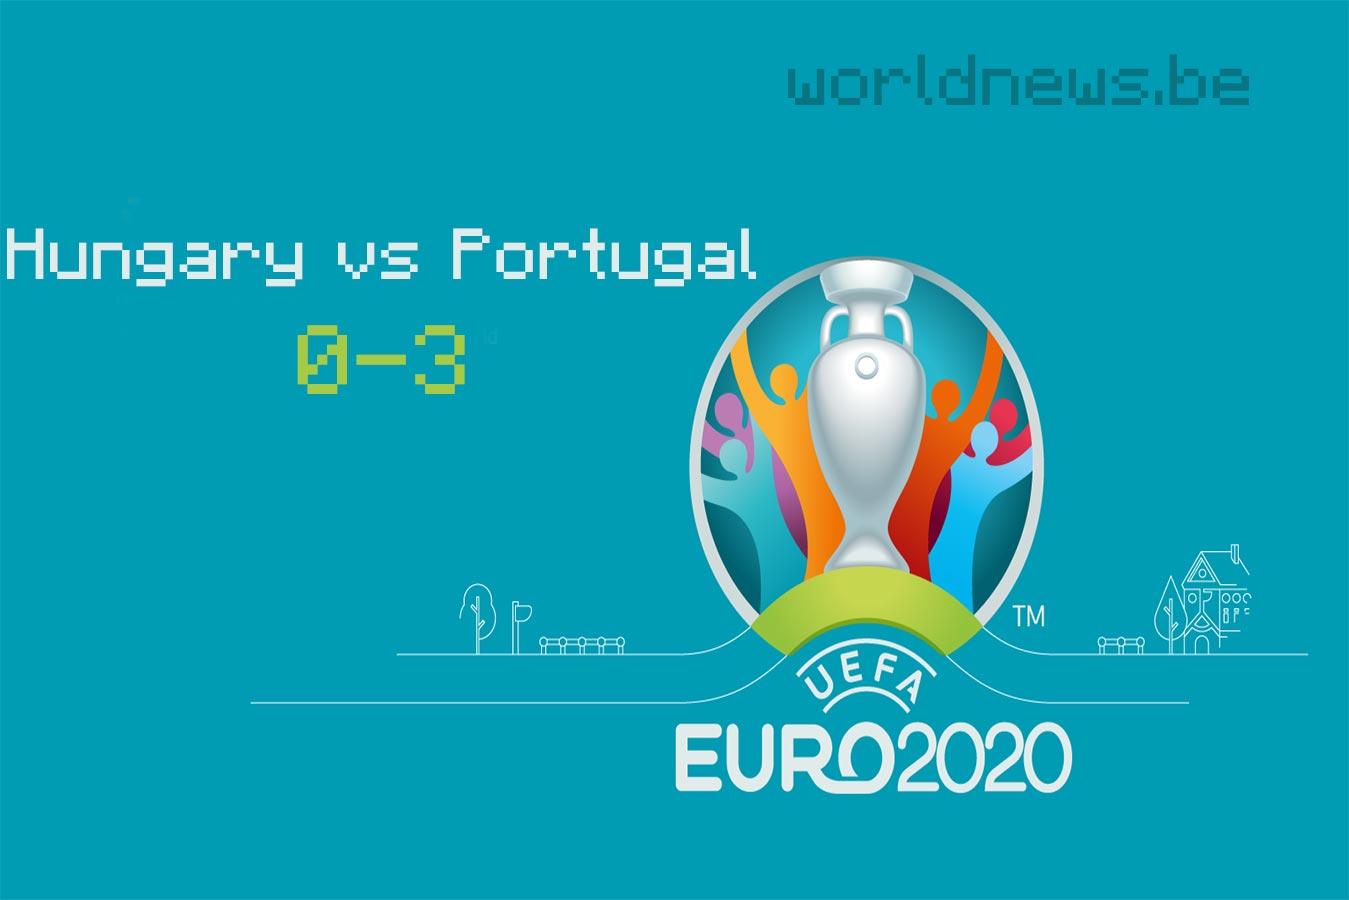 Portugal beat Hungary 3-0 in Hungary